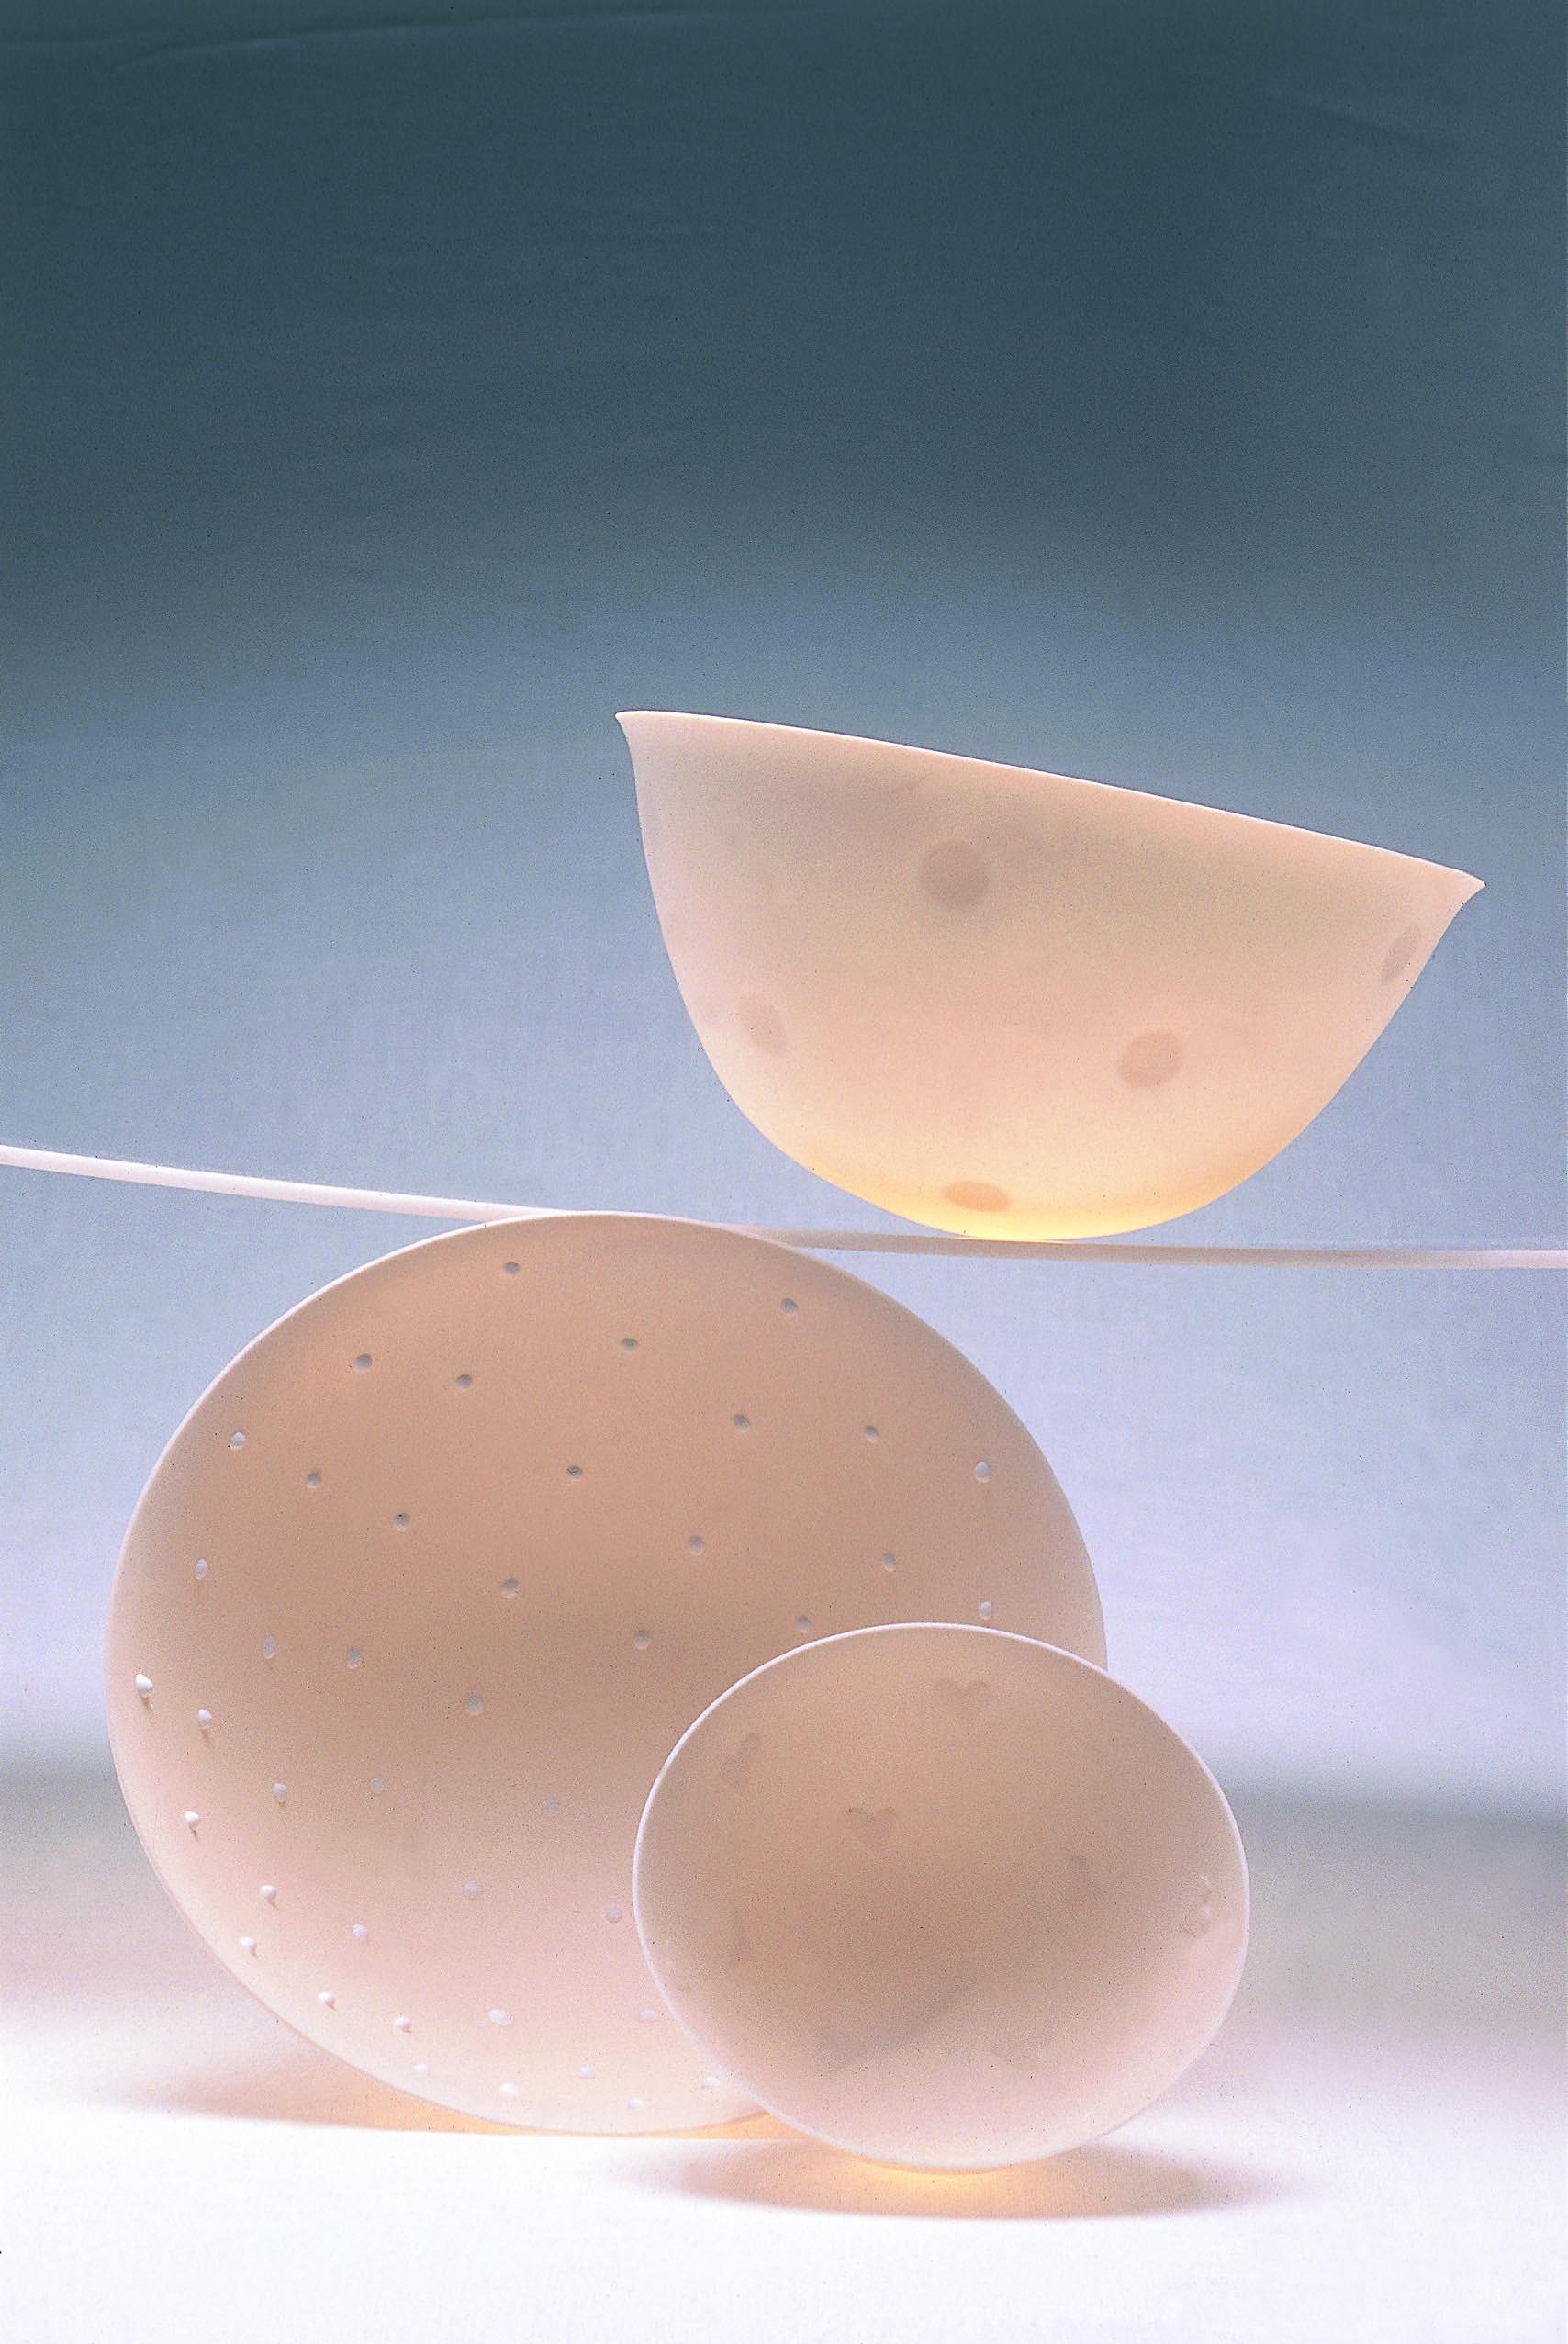 DISC-PINHEAD-HEART  SPUN PORCELAIN VESSELS  BONE CHINA  PHOTO: GRAHAM MURRELL